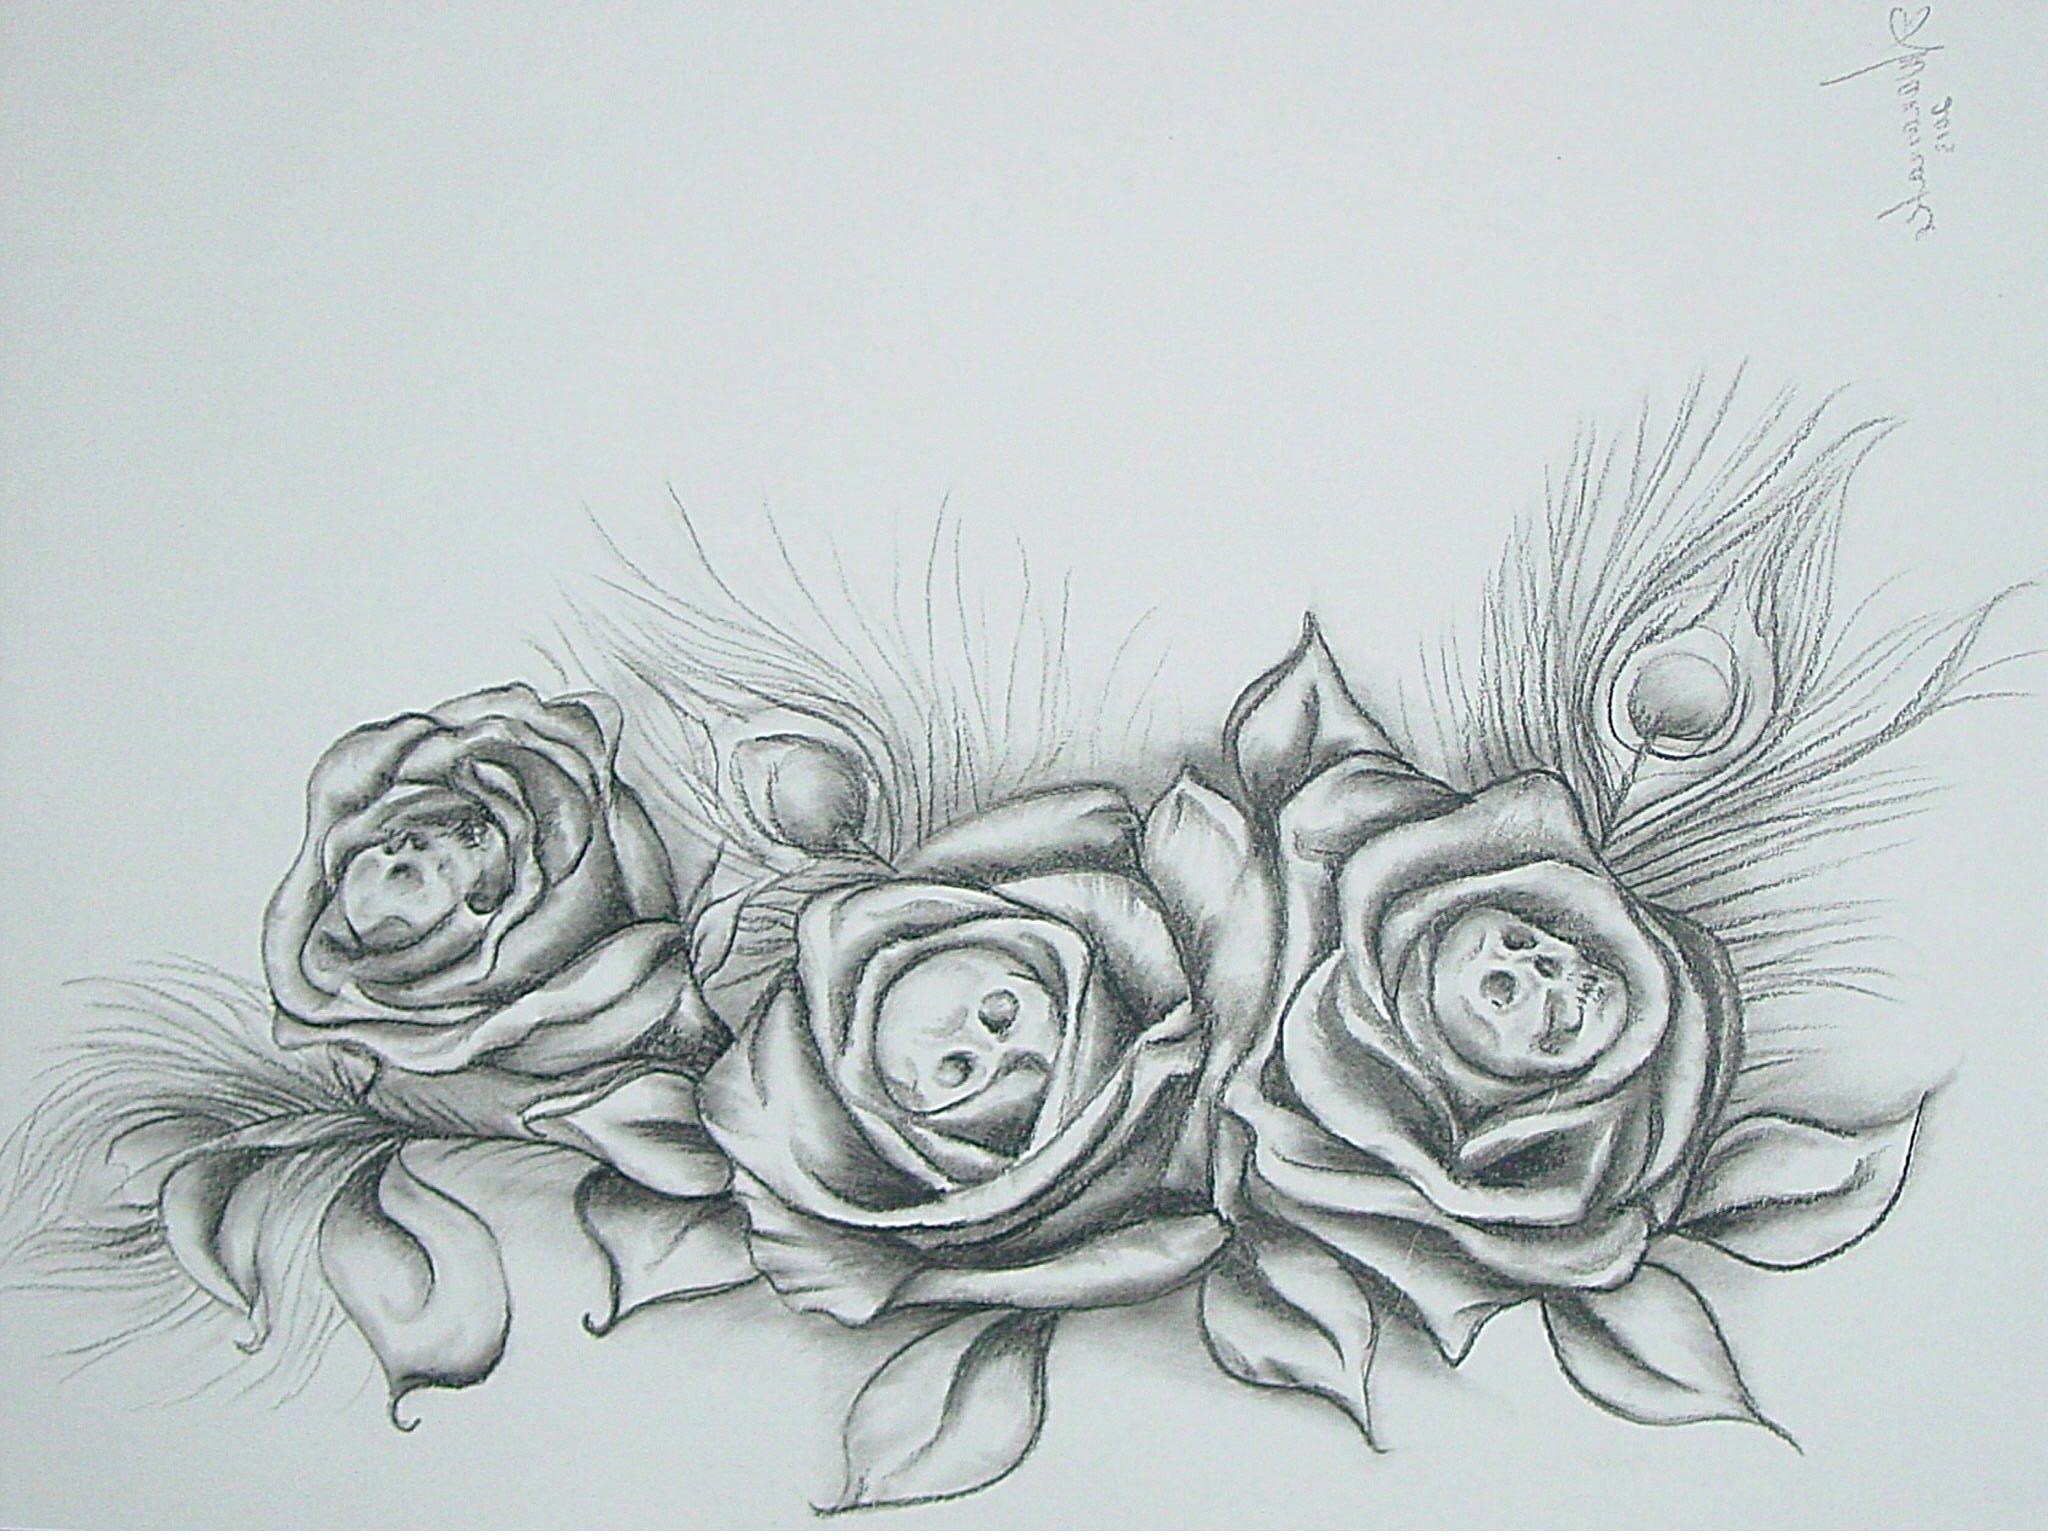 Drawing Of Rose Background Skull Rose Tat My Stuff Pinterest Rose Tat Tatting and My